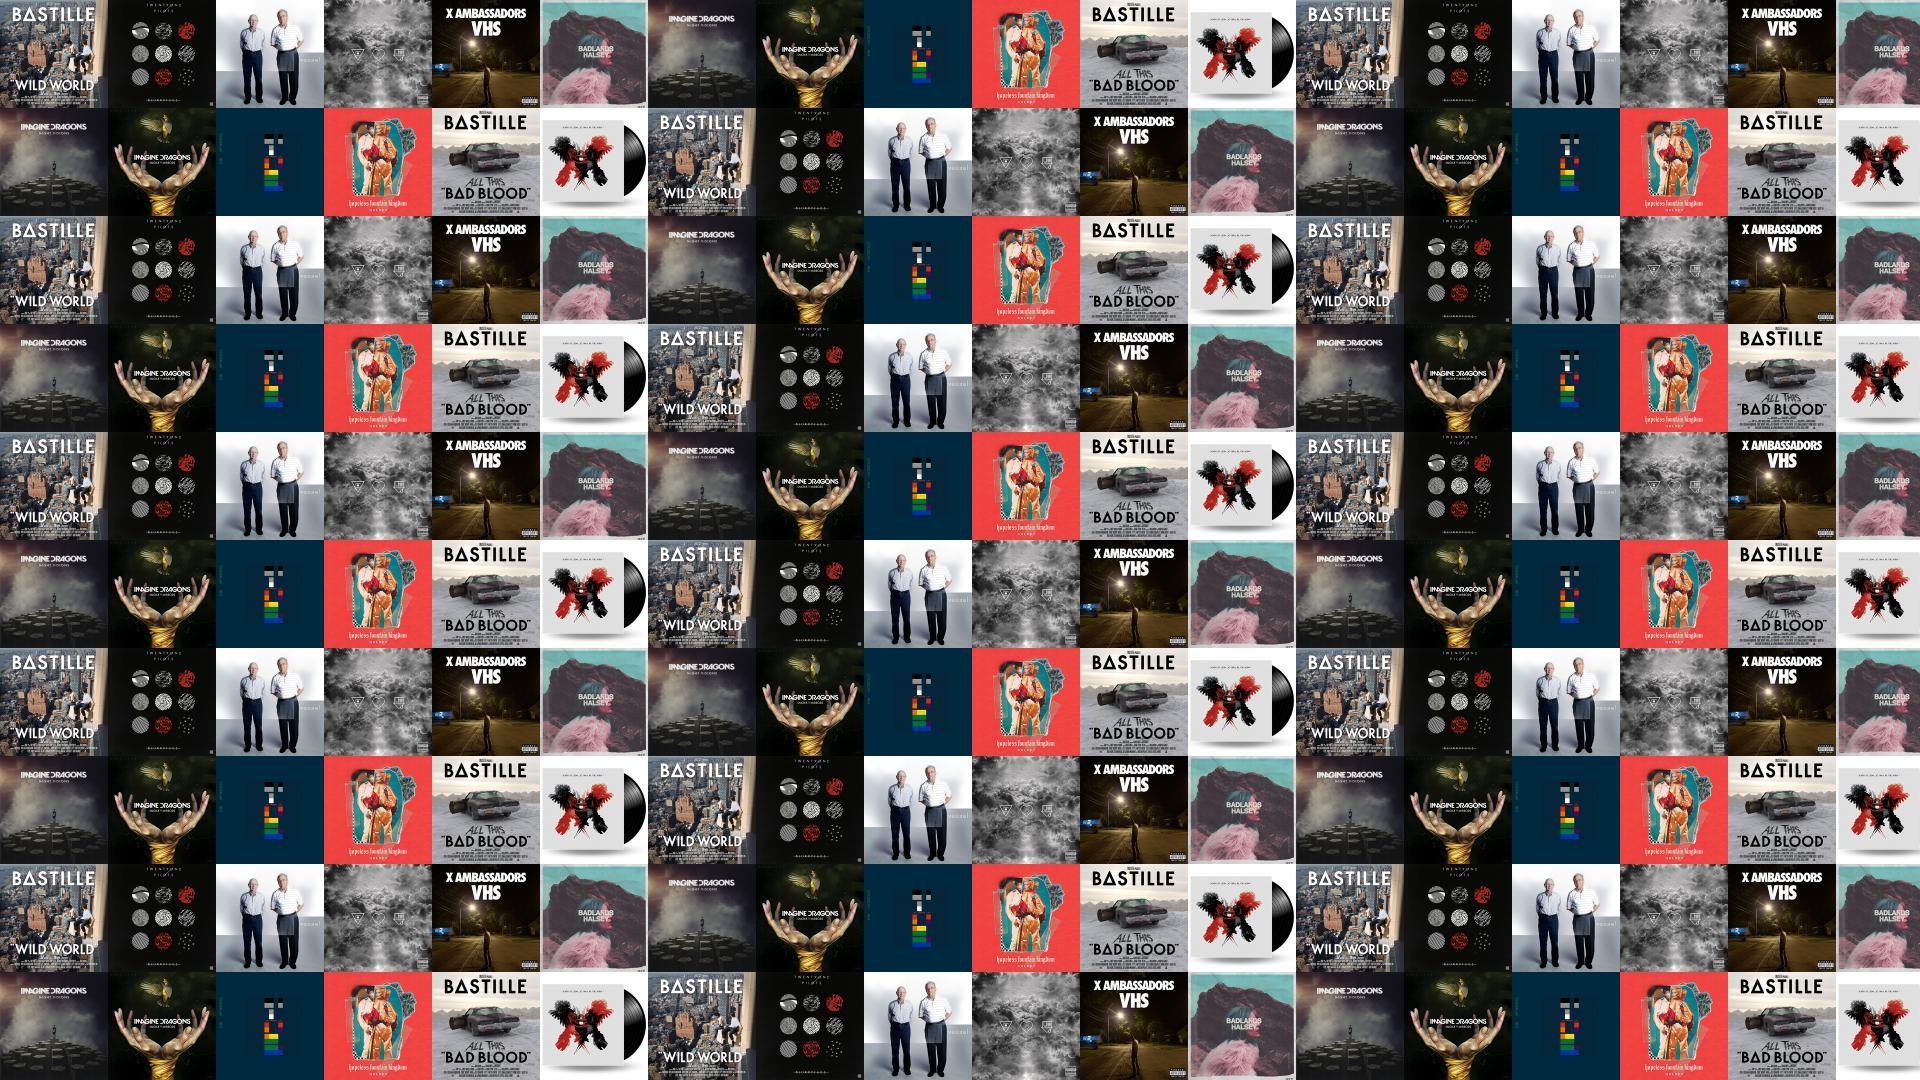 Fall Out Boy Phone Wallpapers Twenty One Pilots Desktop Wallpaper 183 ① Download Free